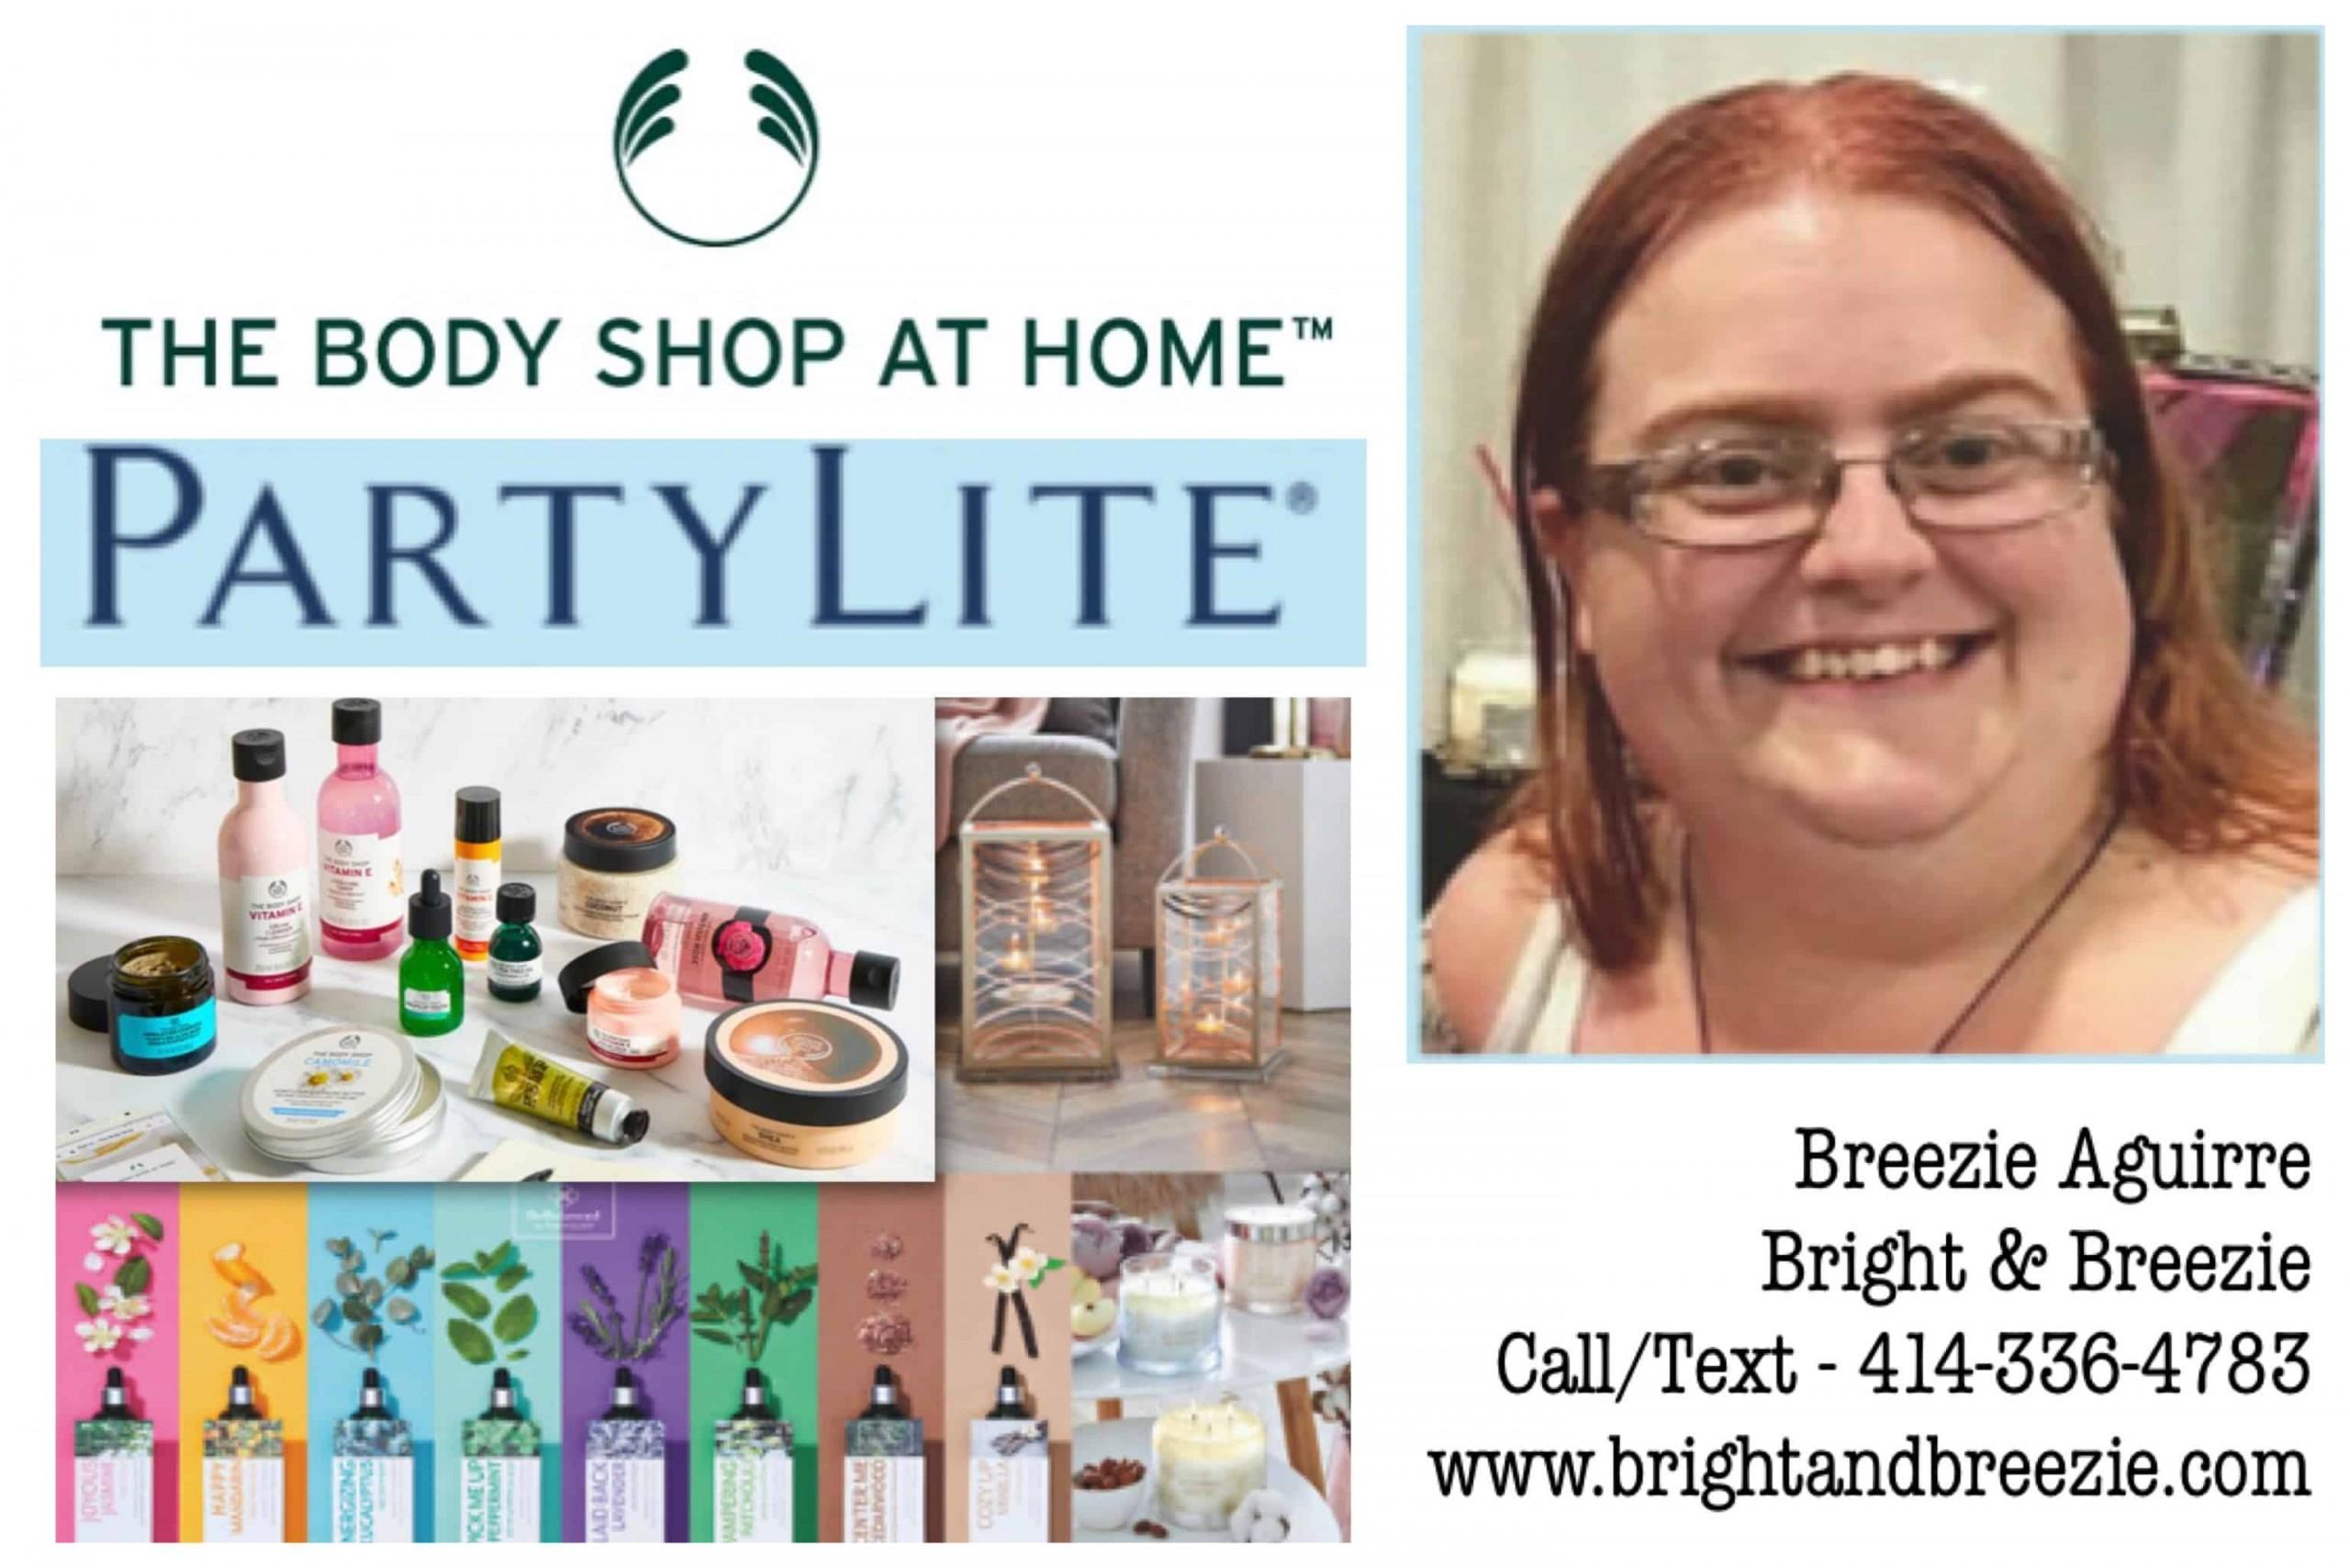 Bright & Breezie Logo